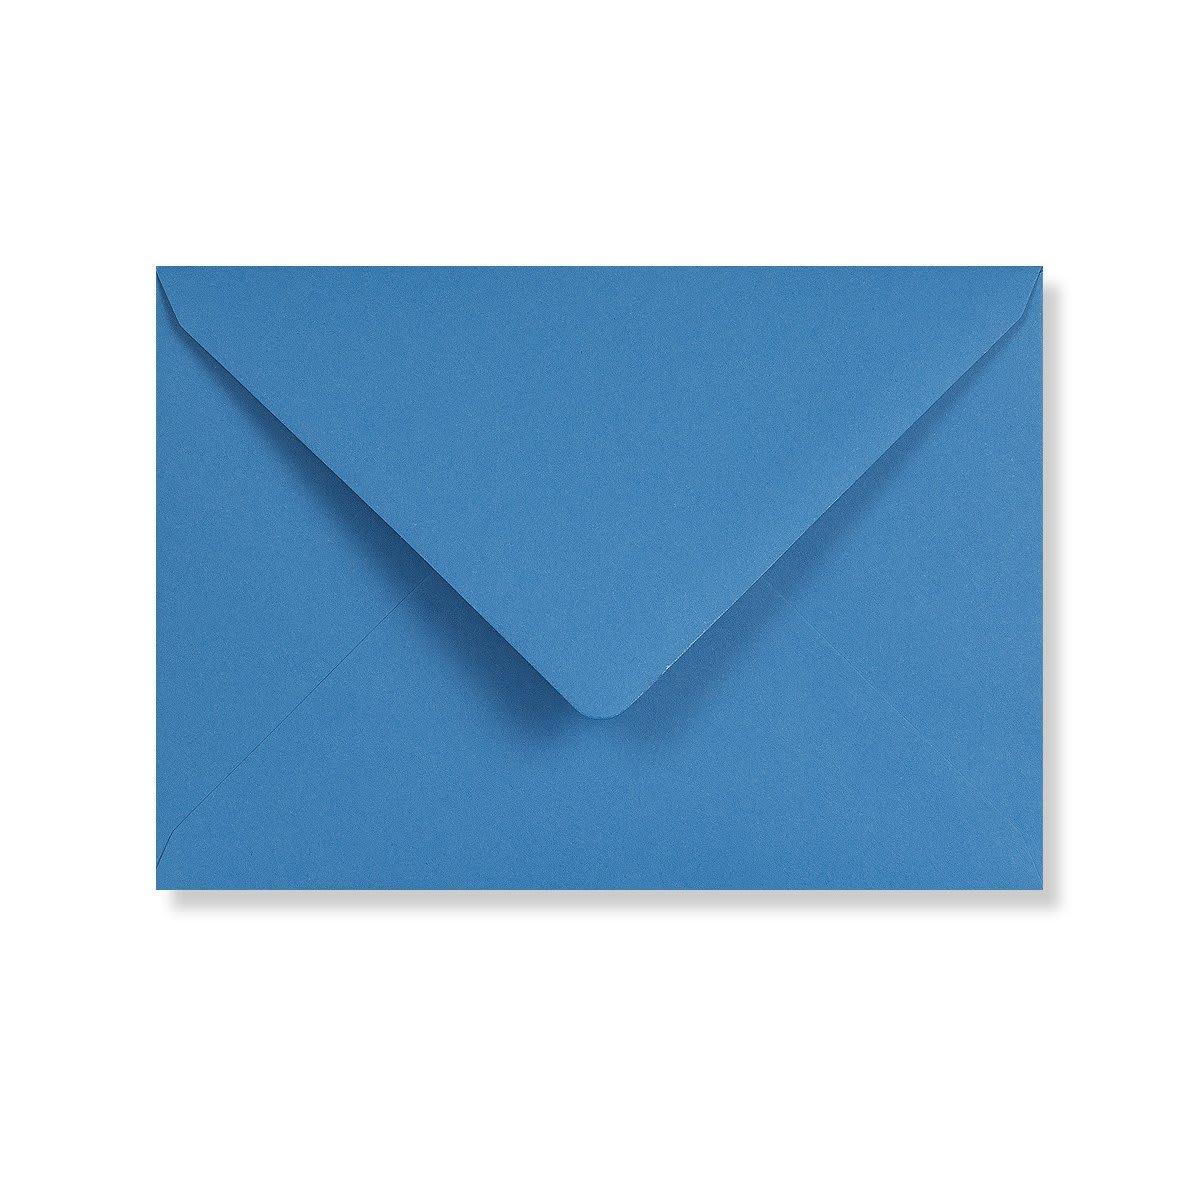 C6 BRIGHT BLUE ENVELOPES 120GSM